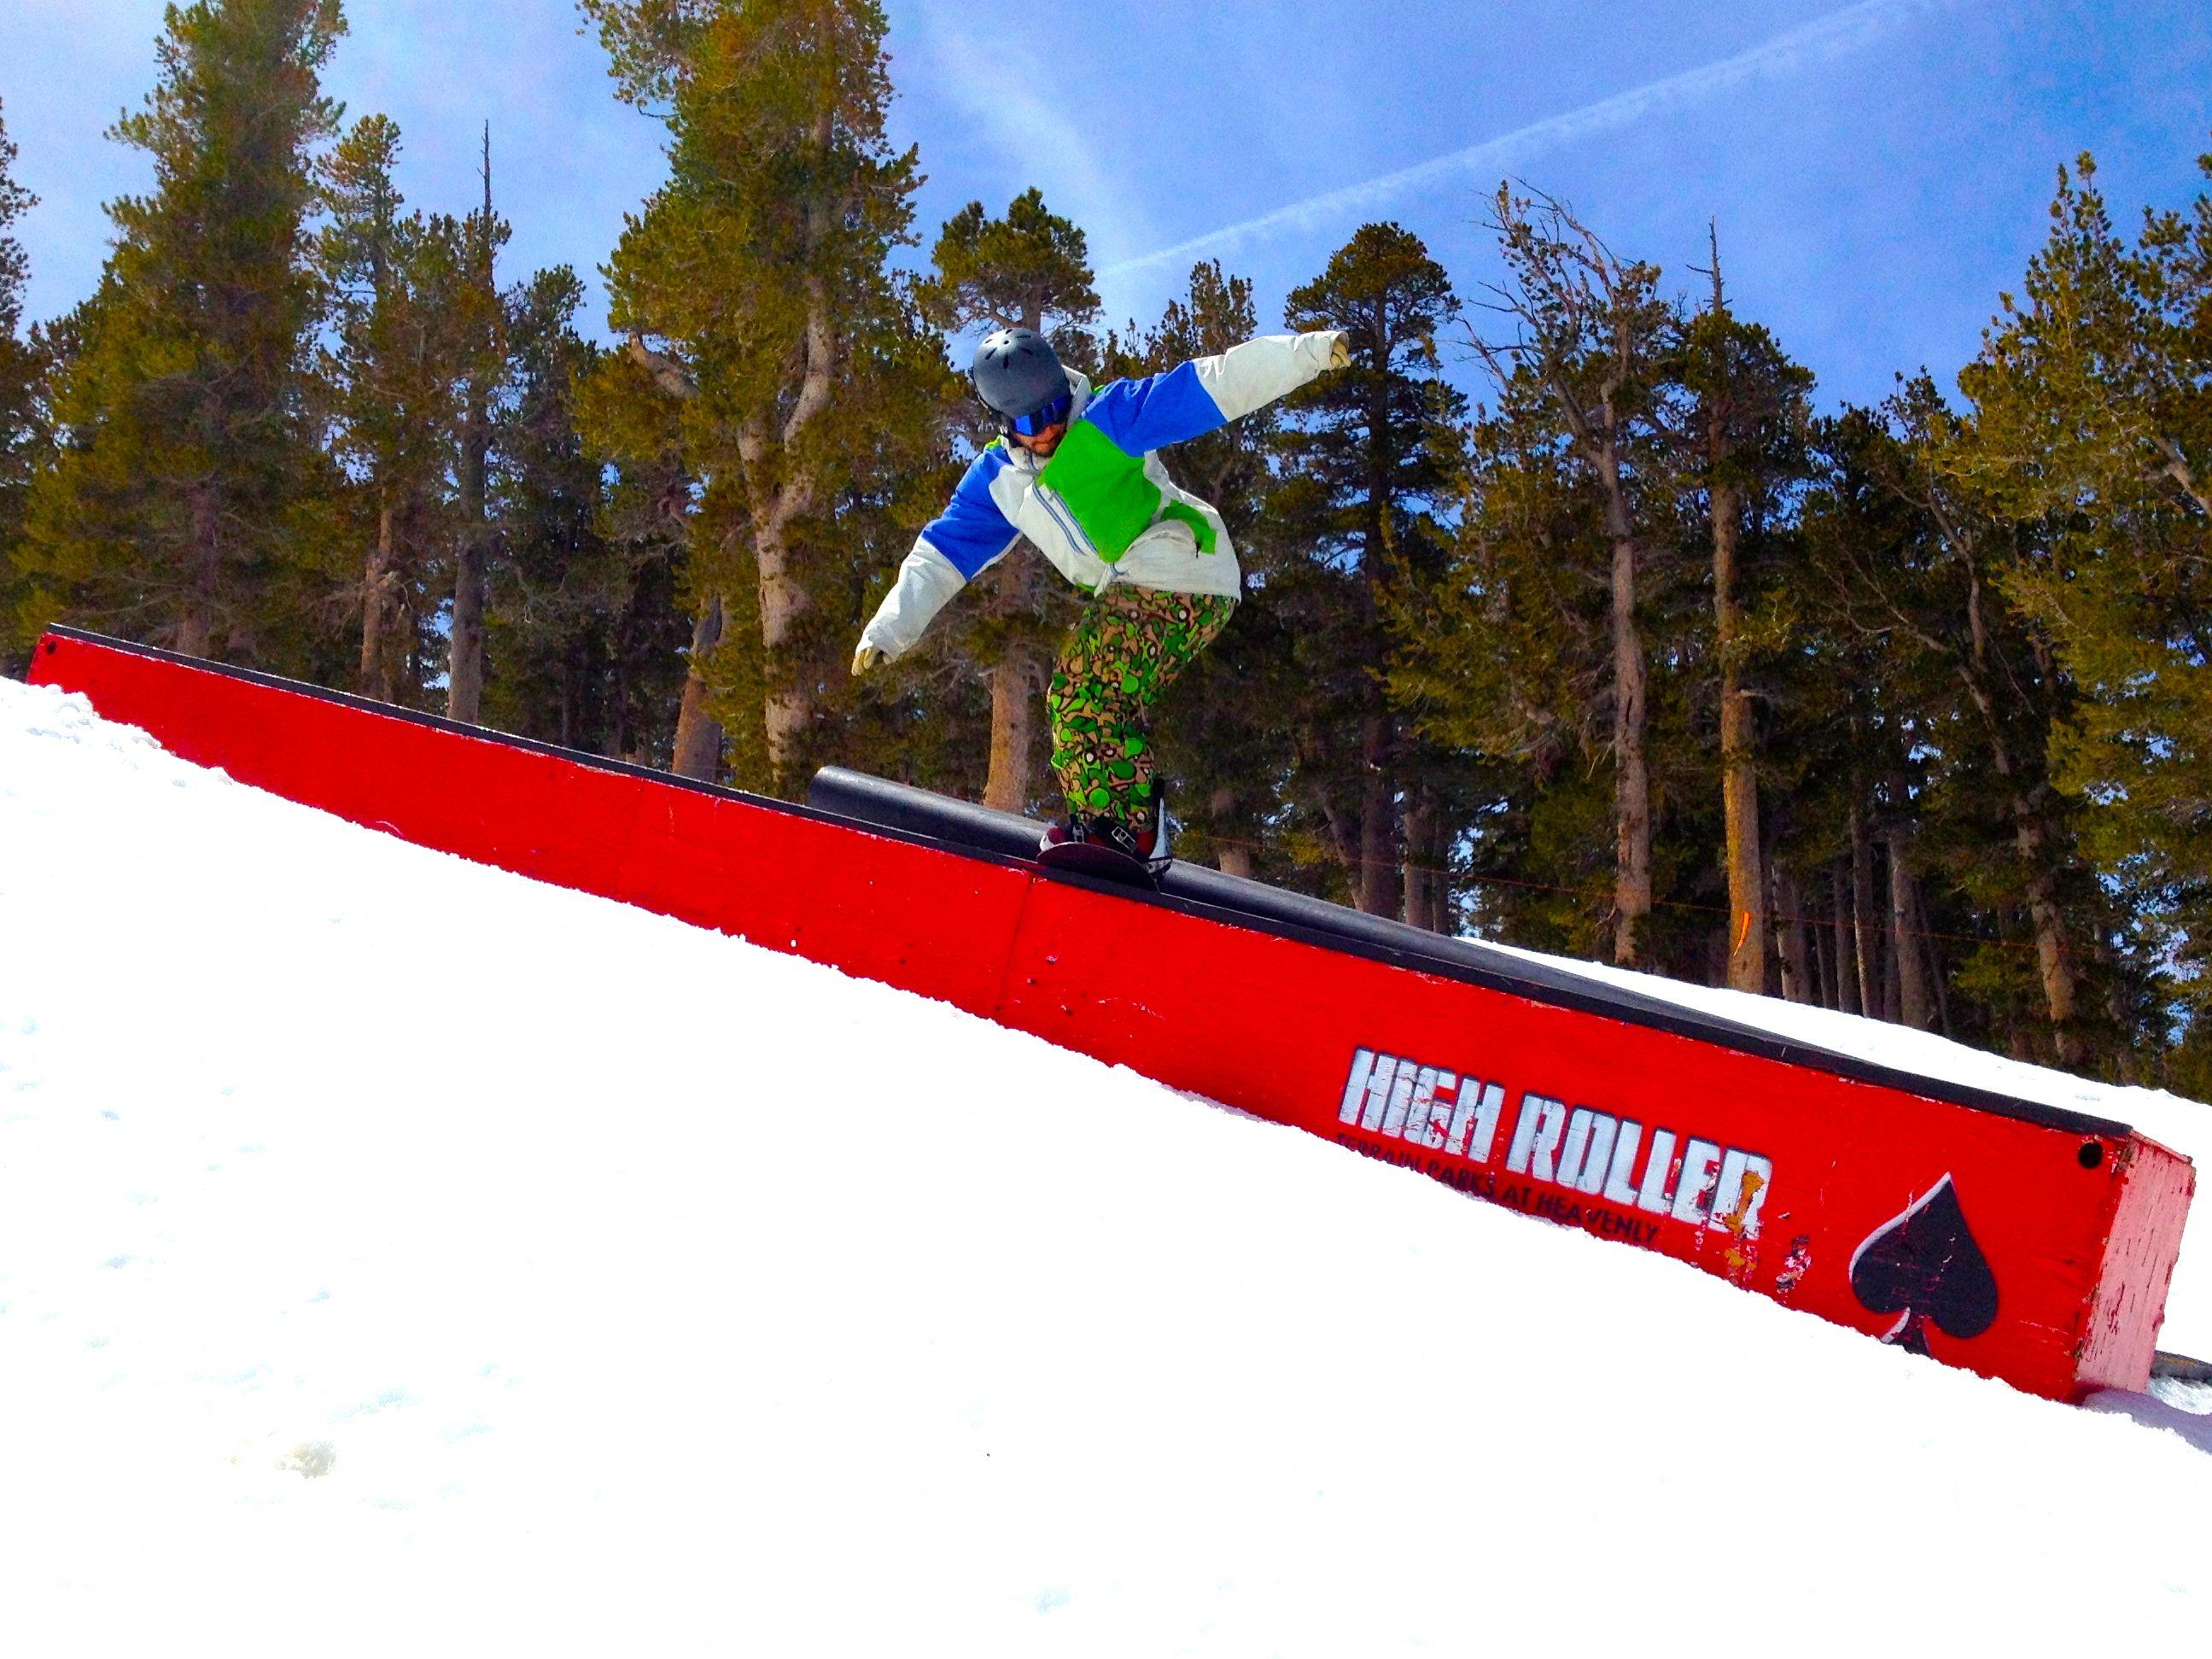 Great Rail Shot Taken At High Roller Terrain Park At Heavenly Ski Resort During Our Ski Vacation Www Arctivity Com With Images Heavenly Resort Ski Resort Resort